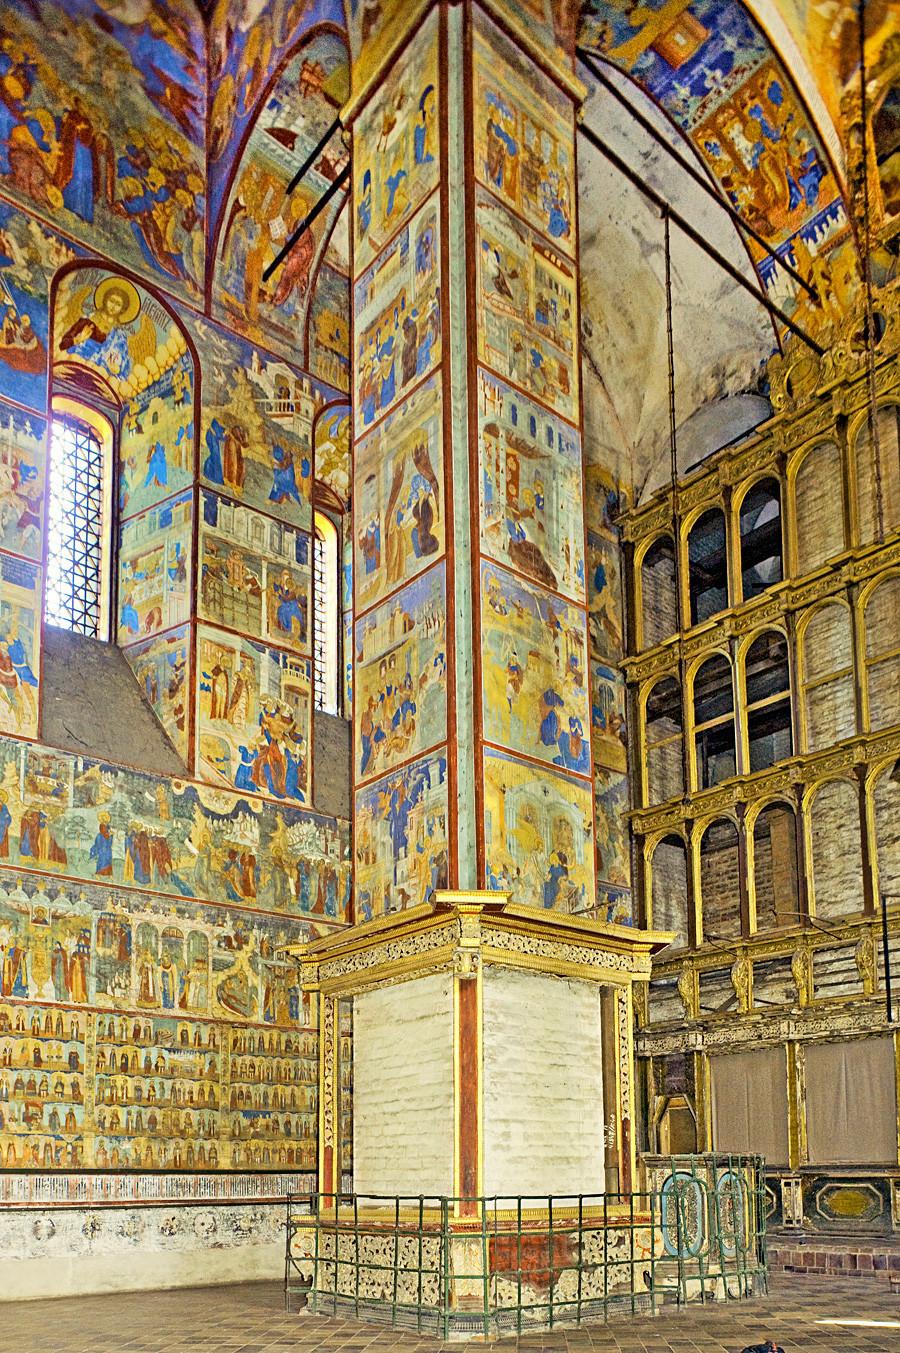 Gereja Pemenggalan Yohanes Pembaptis. Dermaga barat laut. Latar belakang: dinding utara dan layar ikon. 15 Agustus 2017.